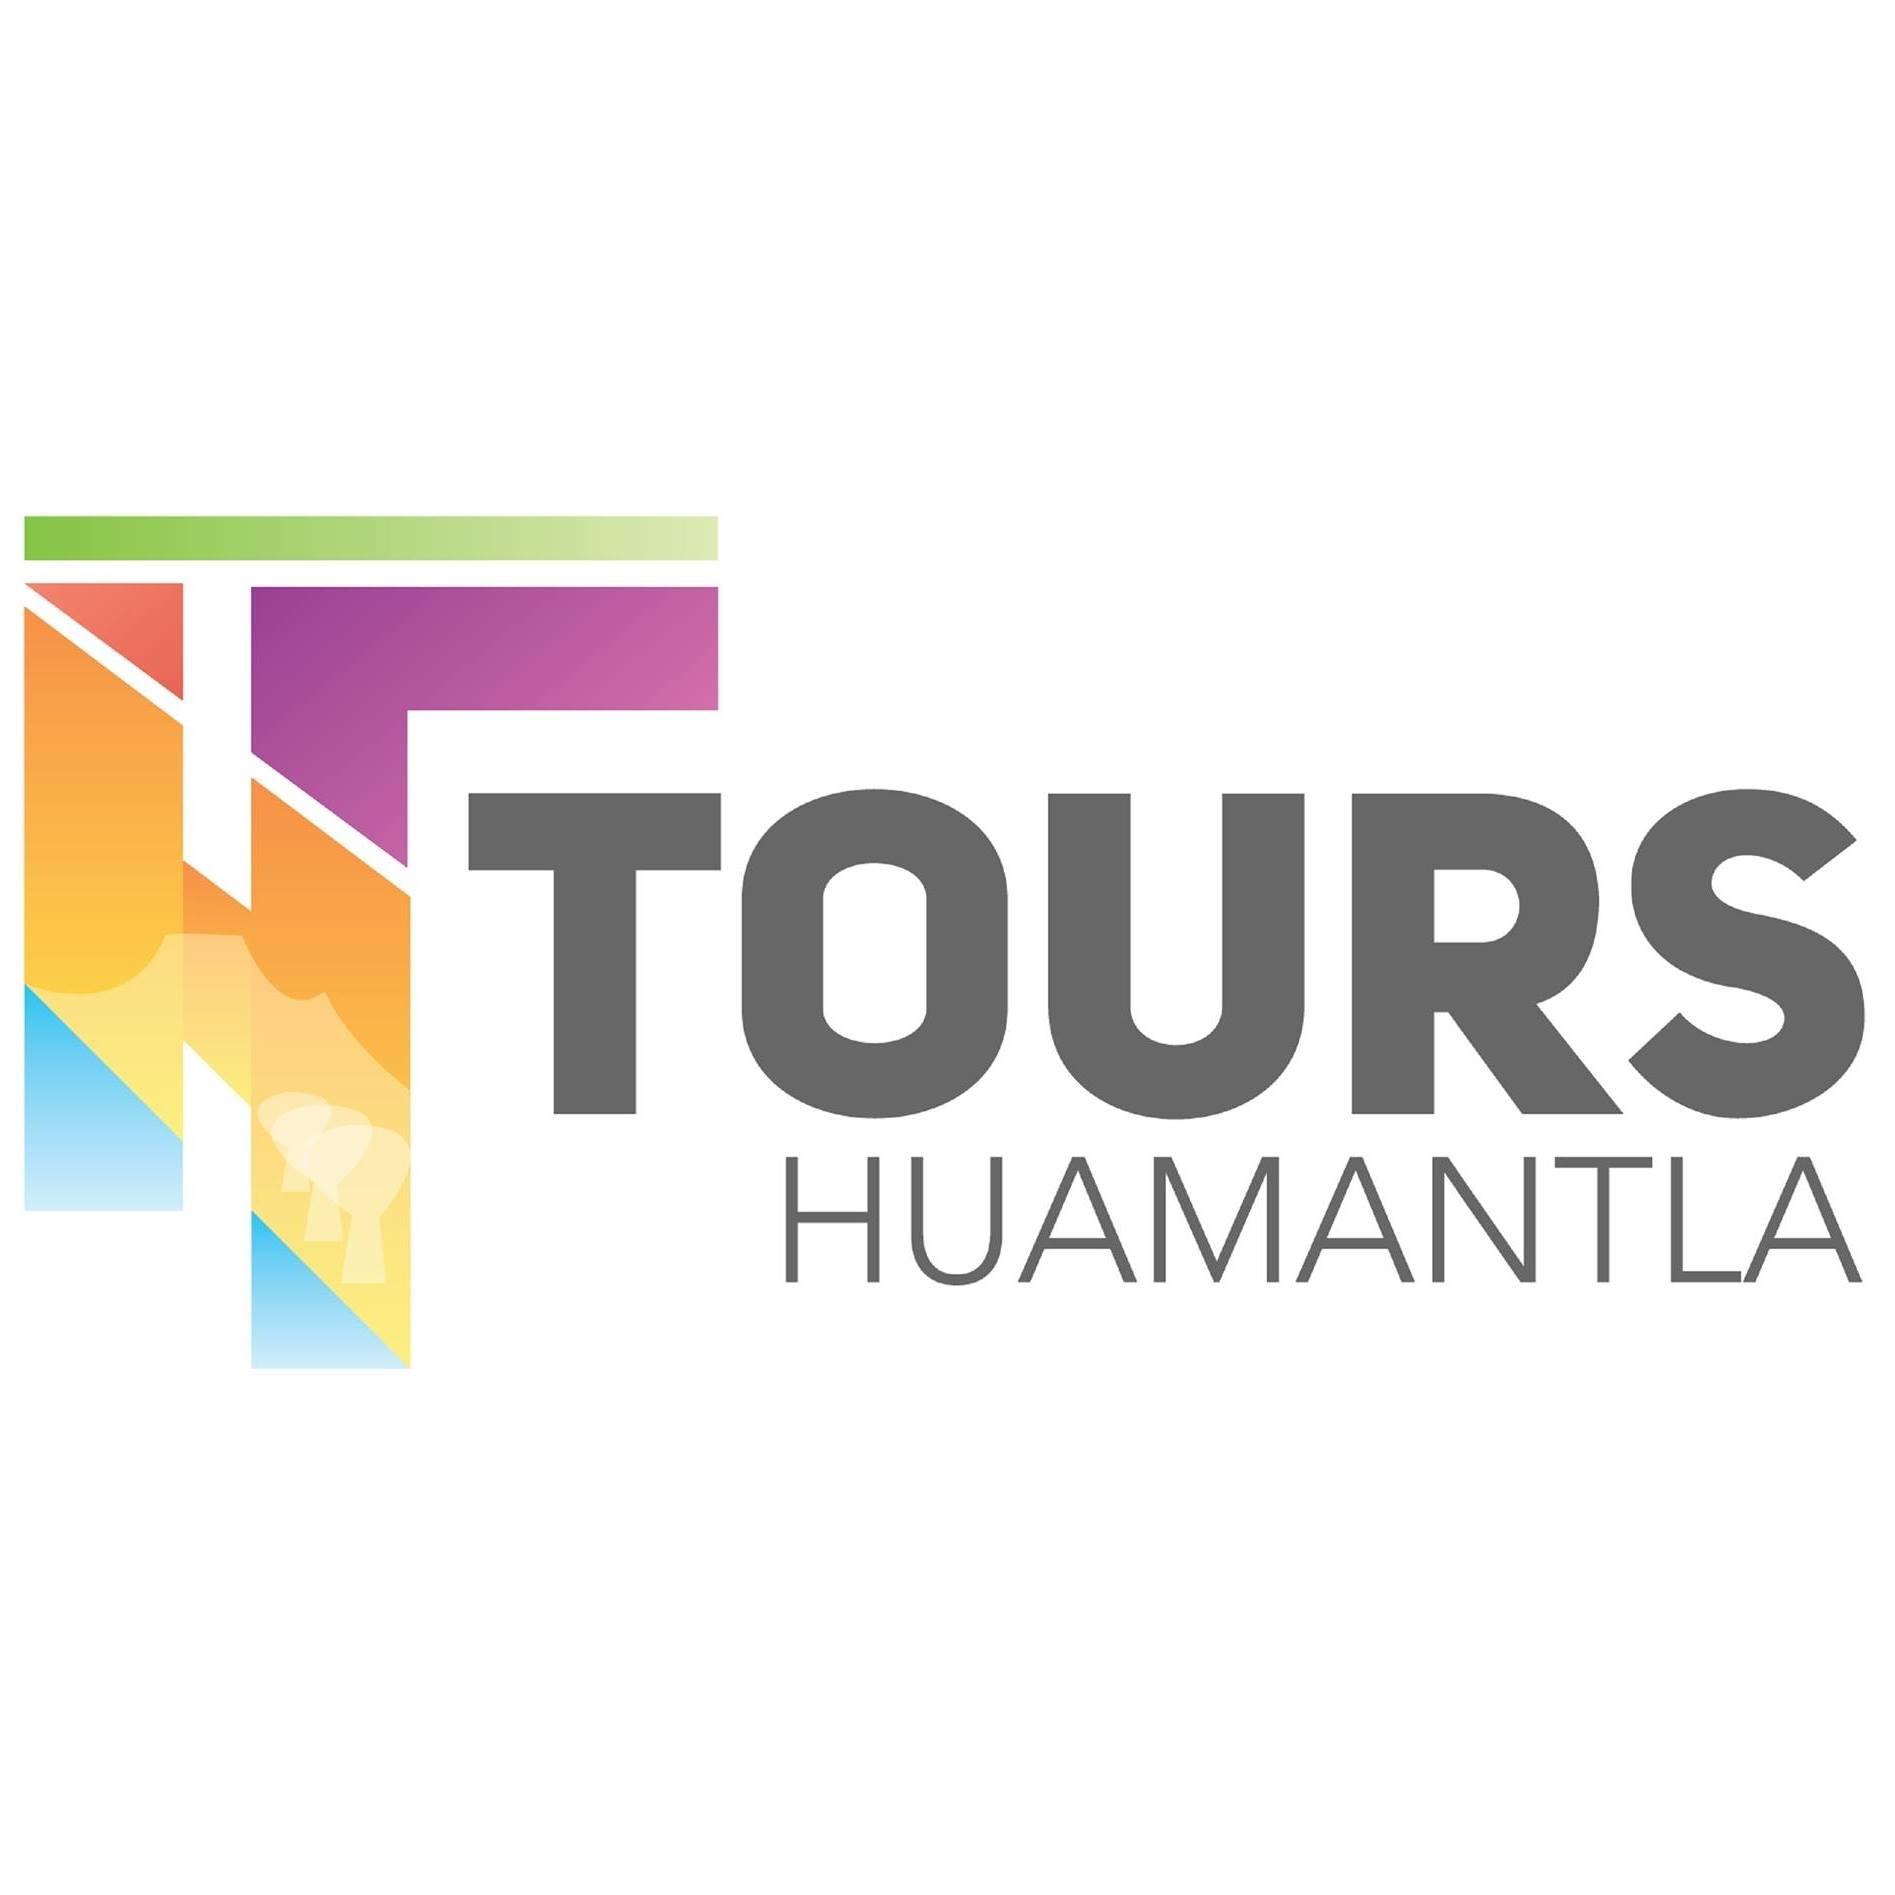 www.facebook.com/tourshuamantla